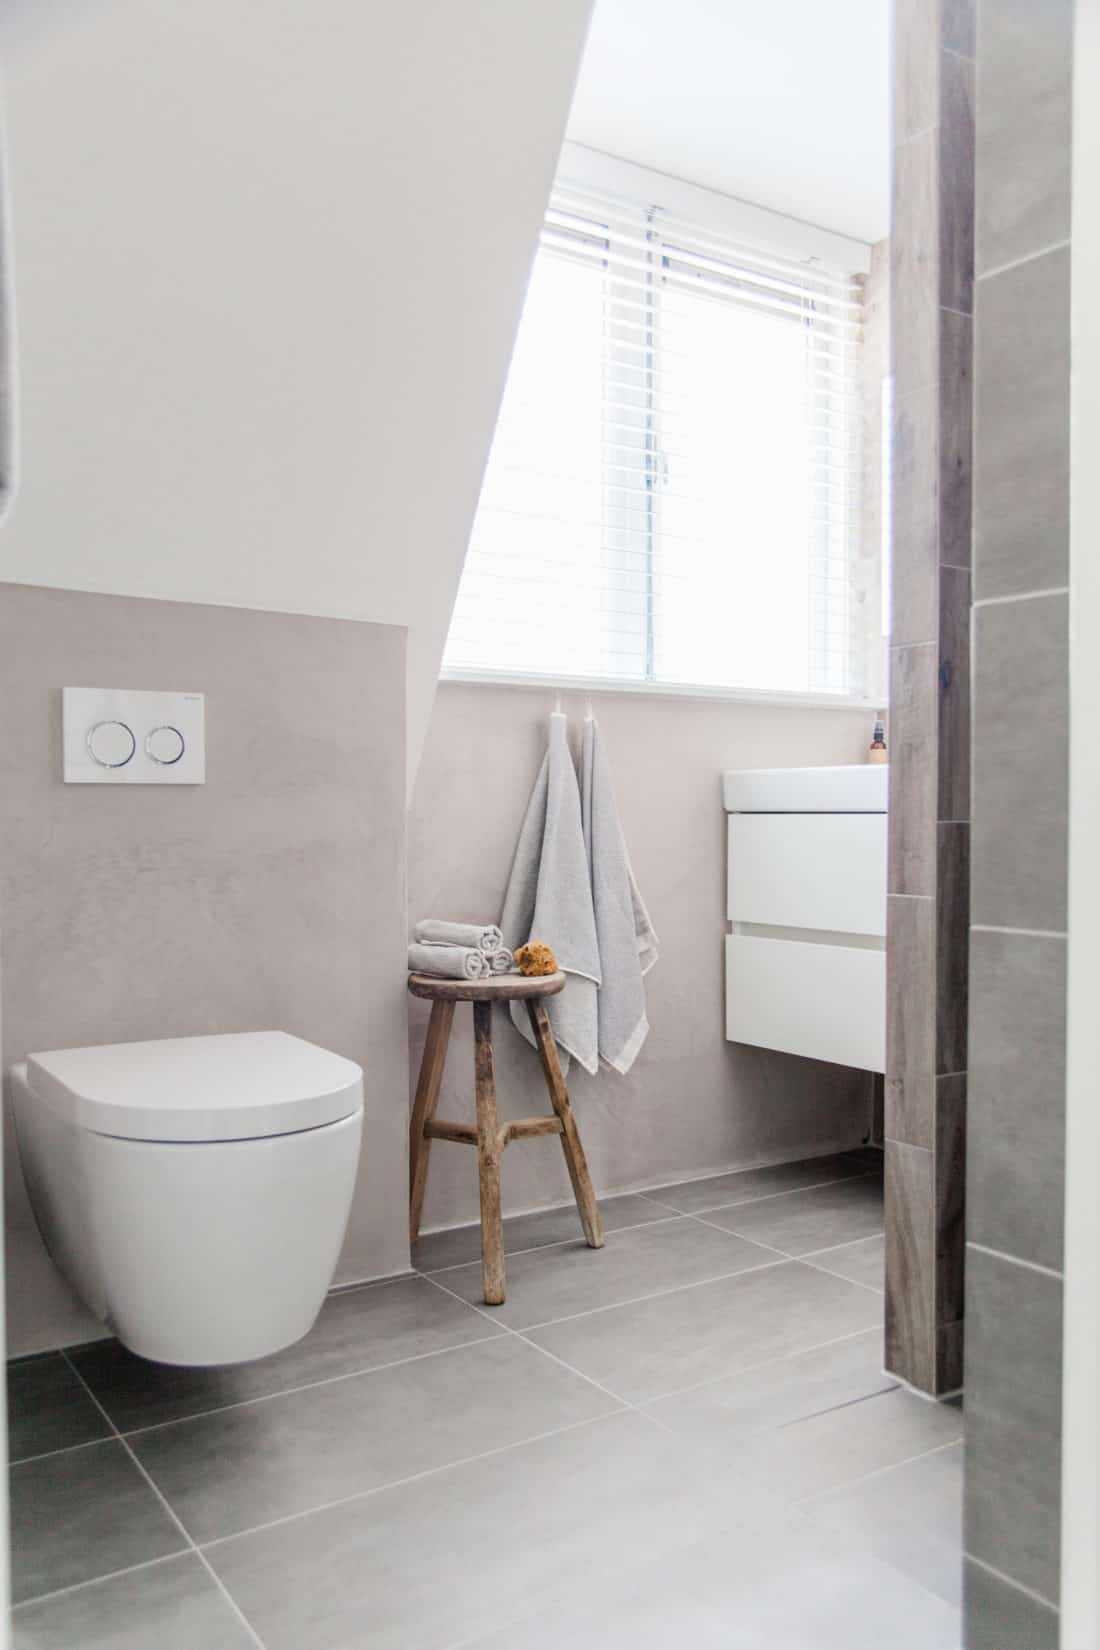 Interieurontwerp bovenverdieping jaren dertig woning badkamer